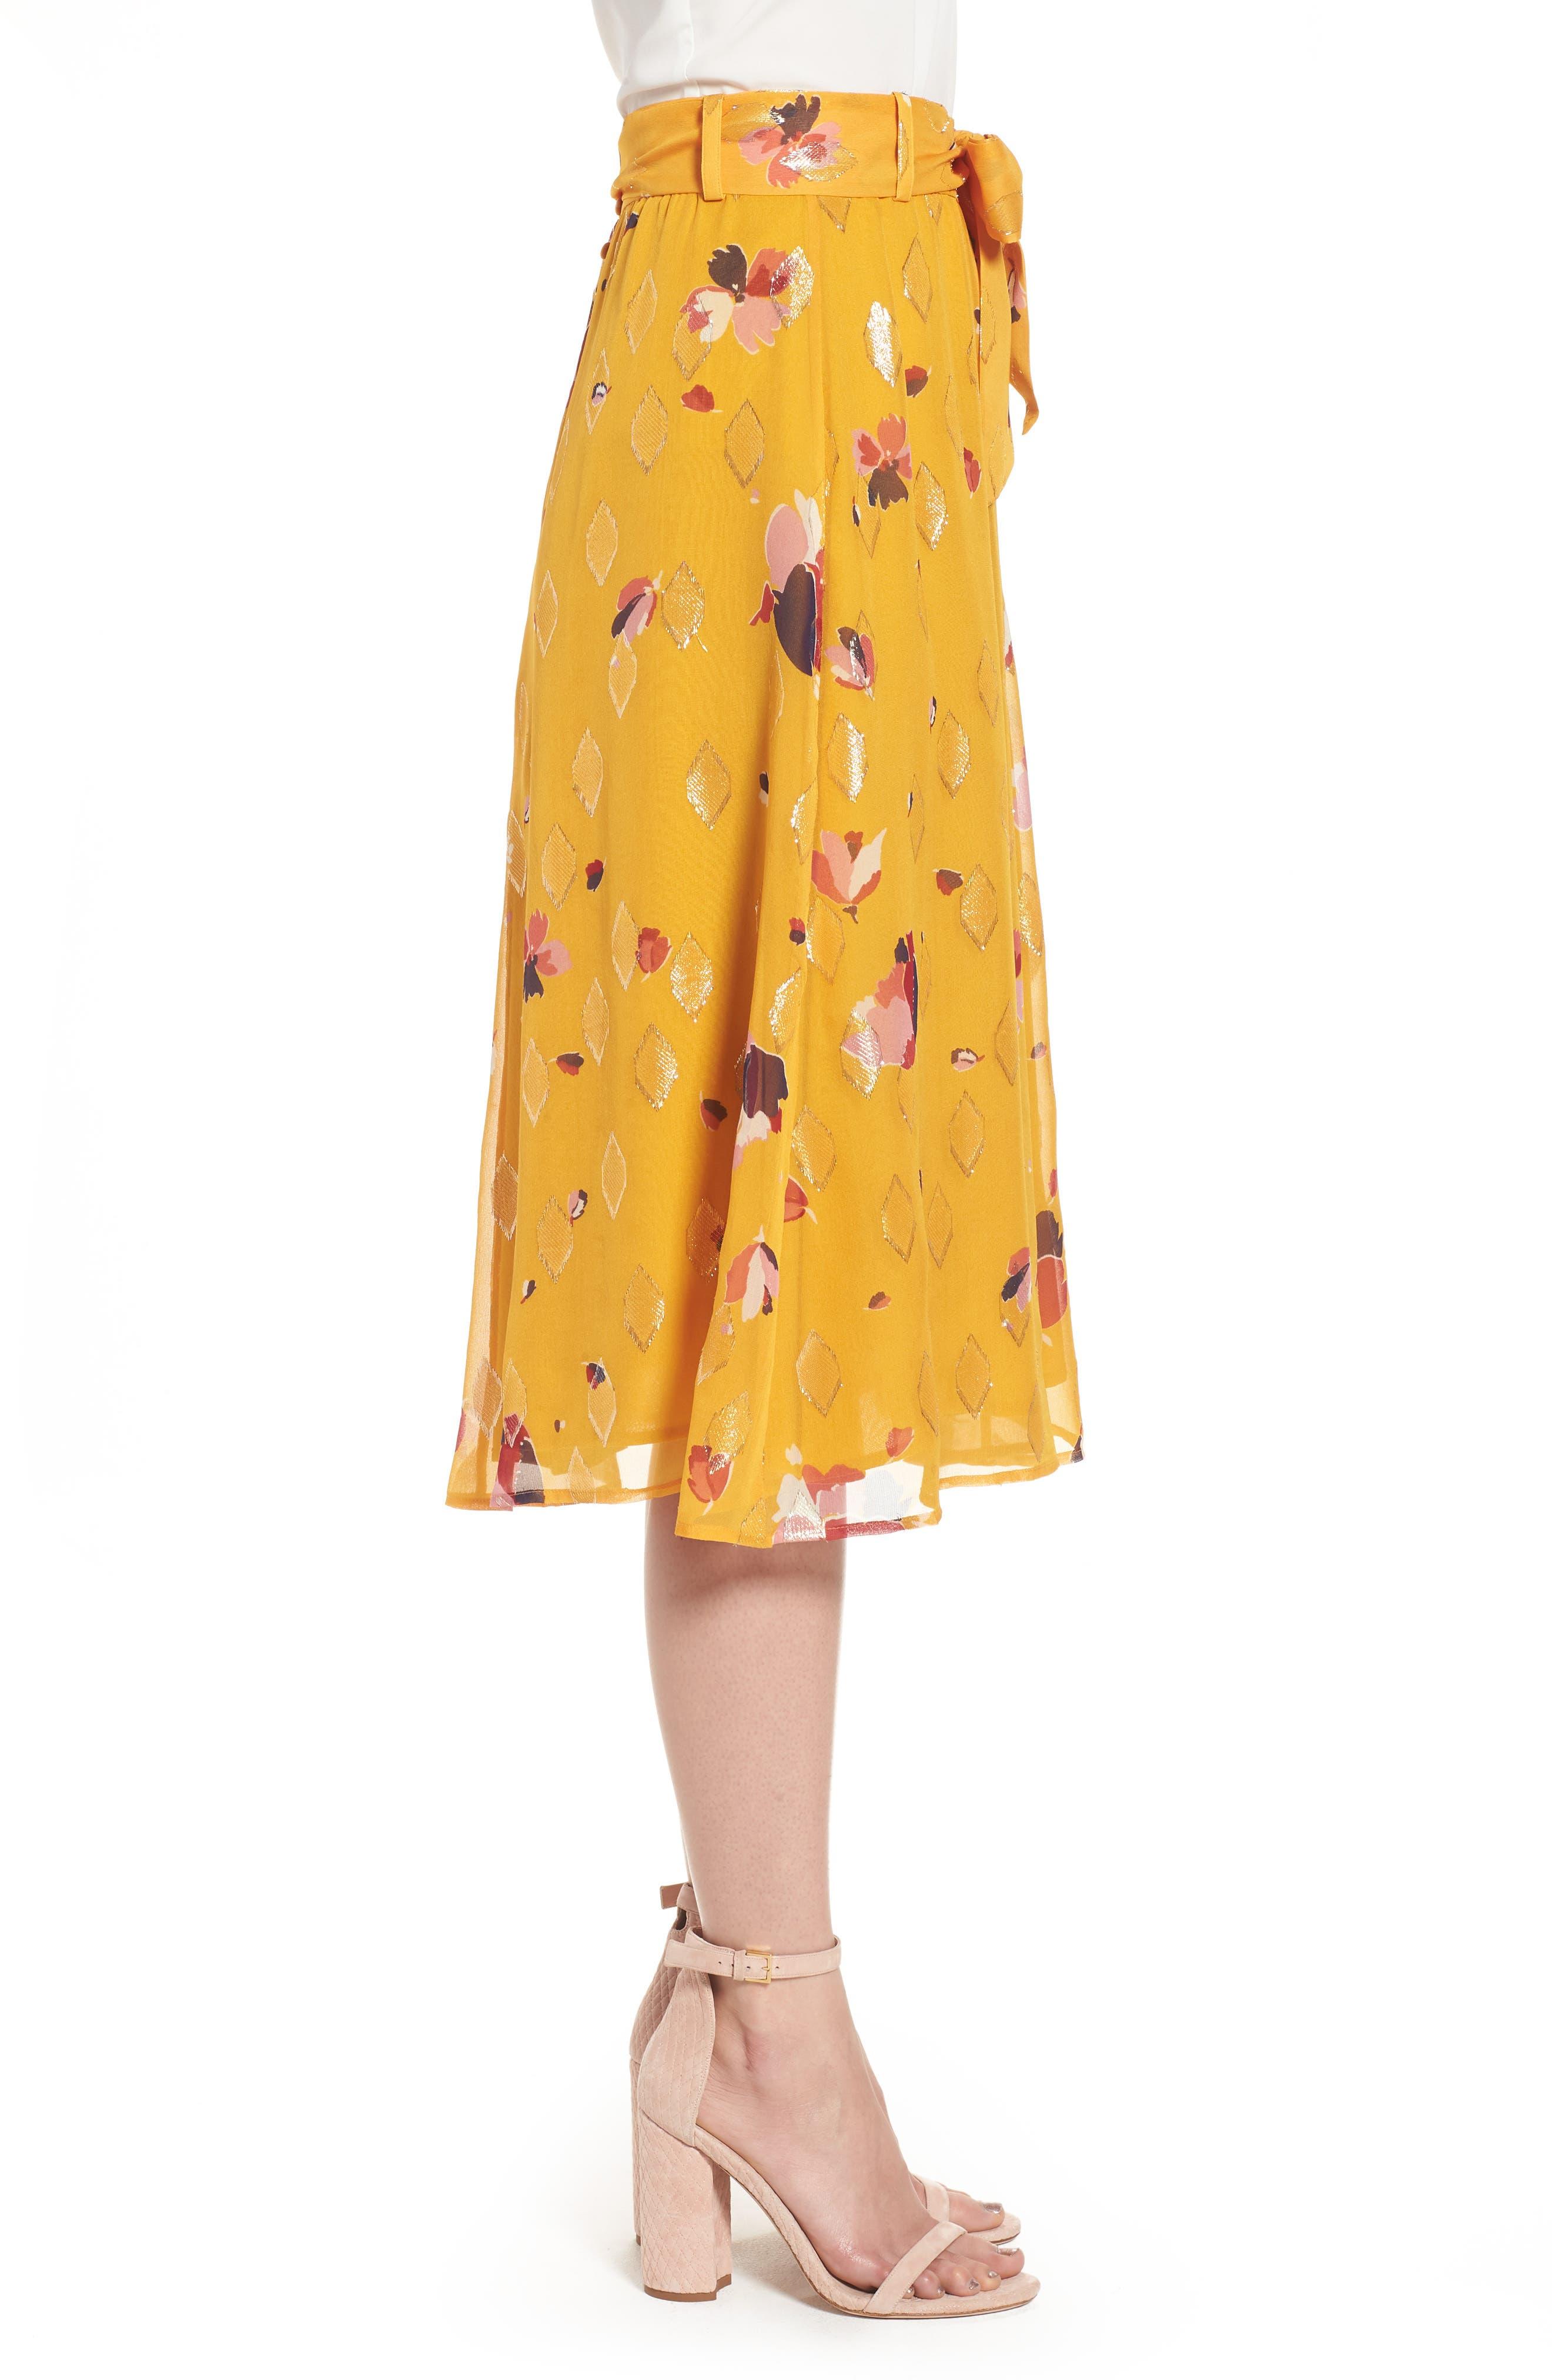 Arizona Floral & Metallic Silk Blend Skirt,                             Alternate thumbnail 4, color,                             Big Flowers 60S On Saffron